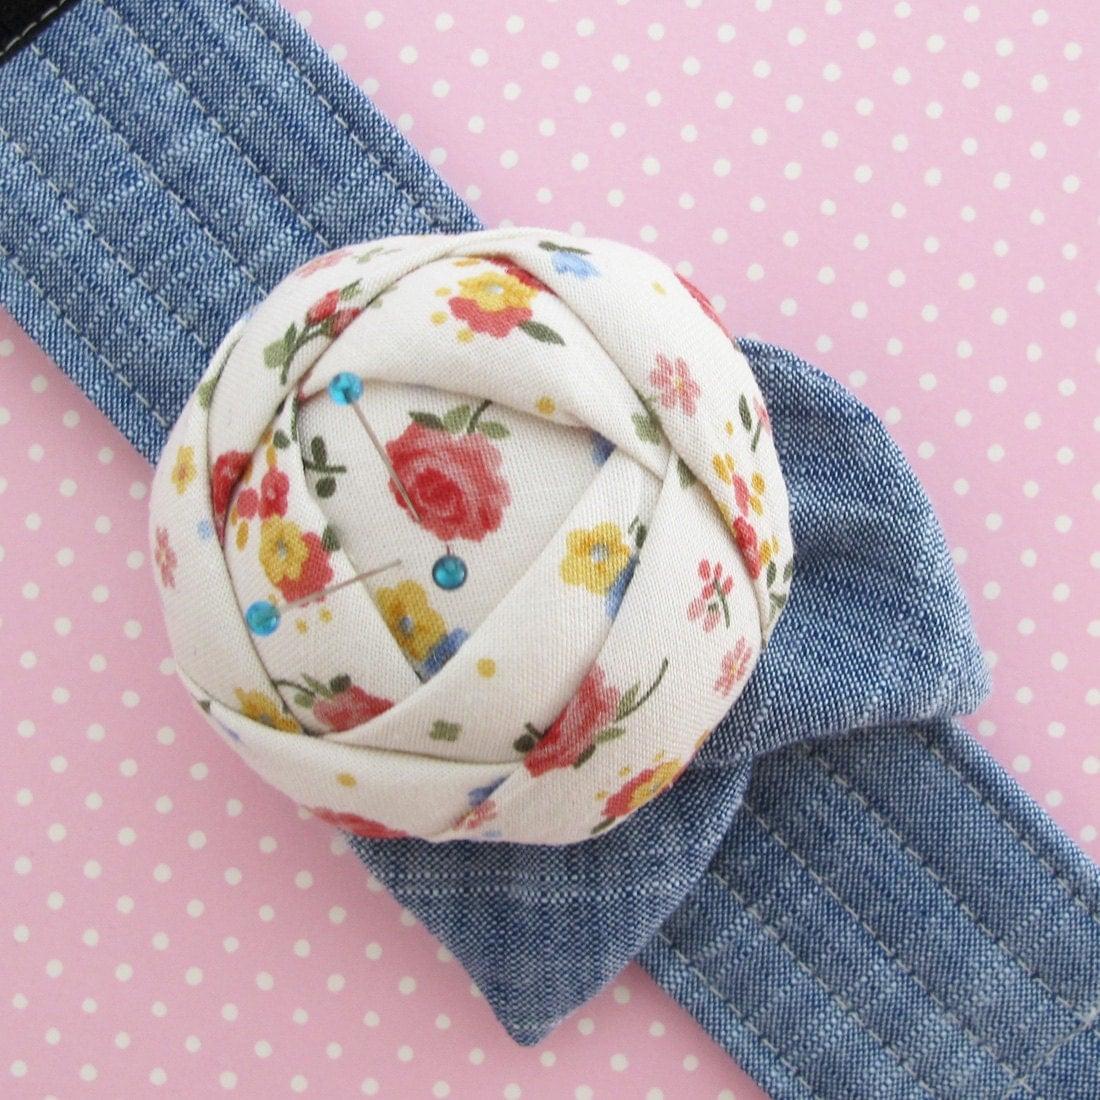 Flower Wrist Pattern: Flower Pincushion Cuff Rose Pin Cushion Wrist Cuff